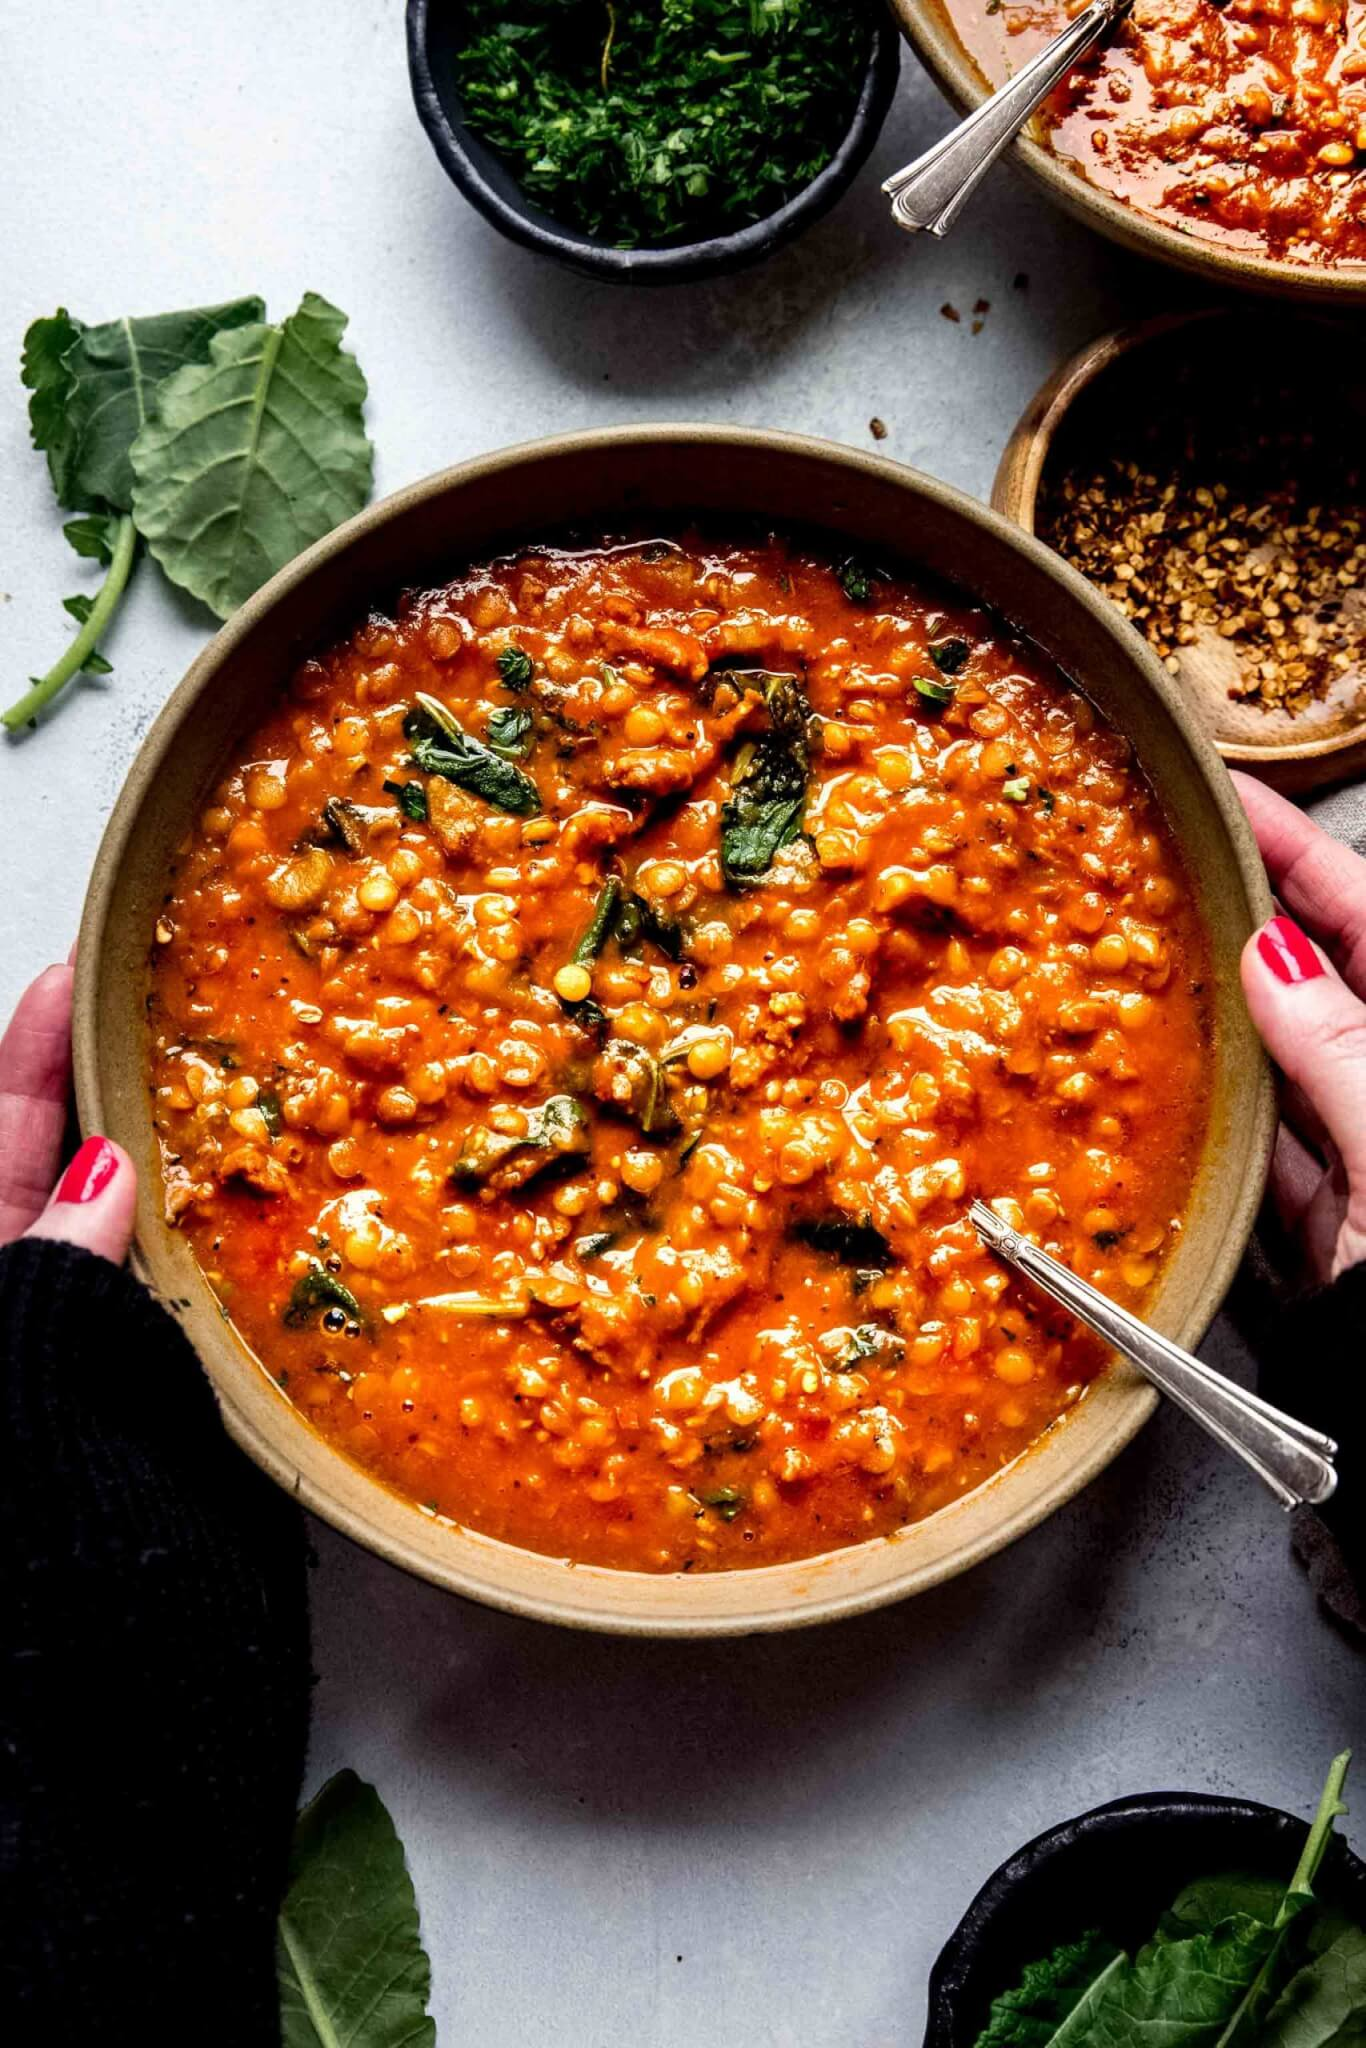 Overhead close up of hands holding bowl of lentil soup.